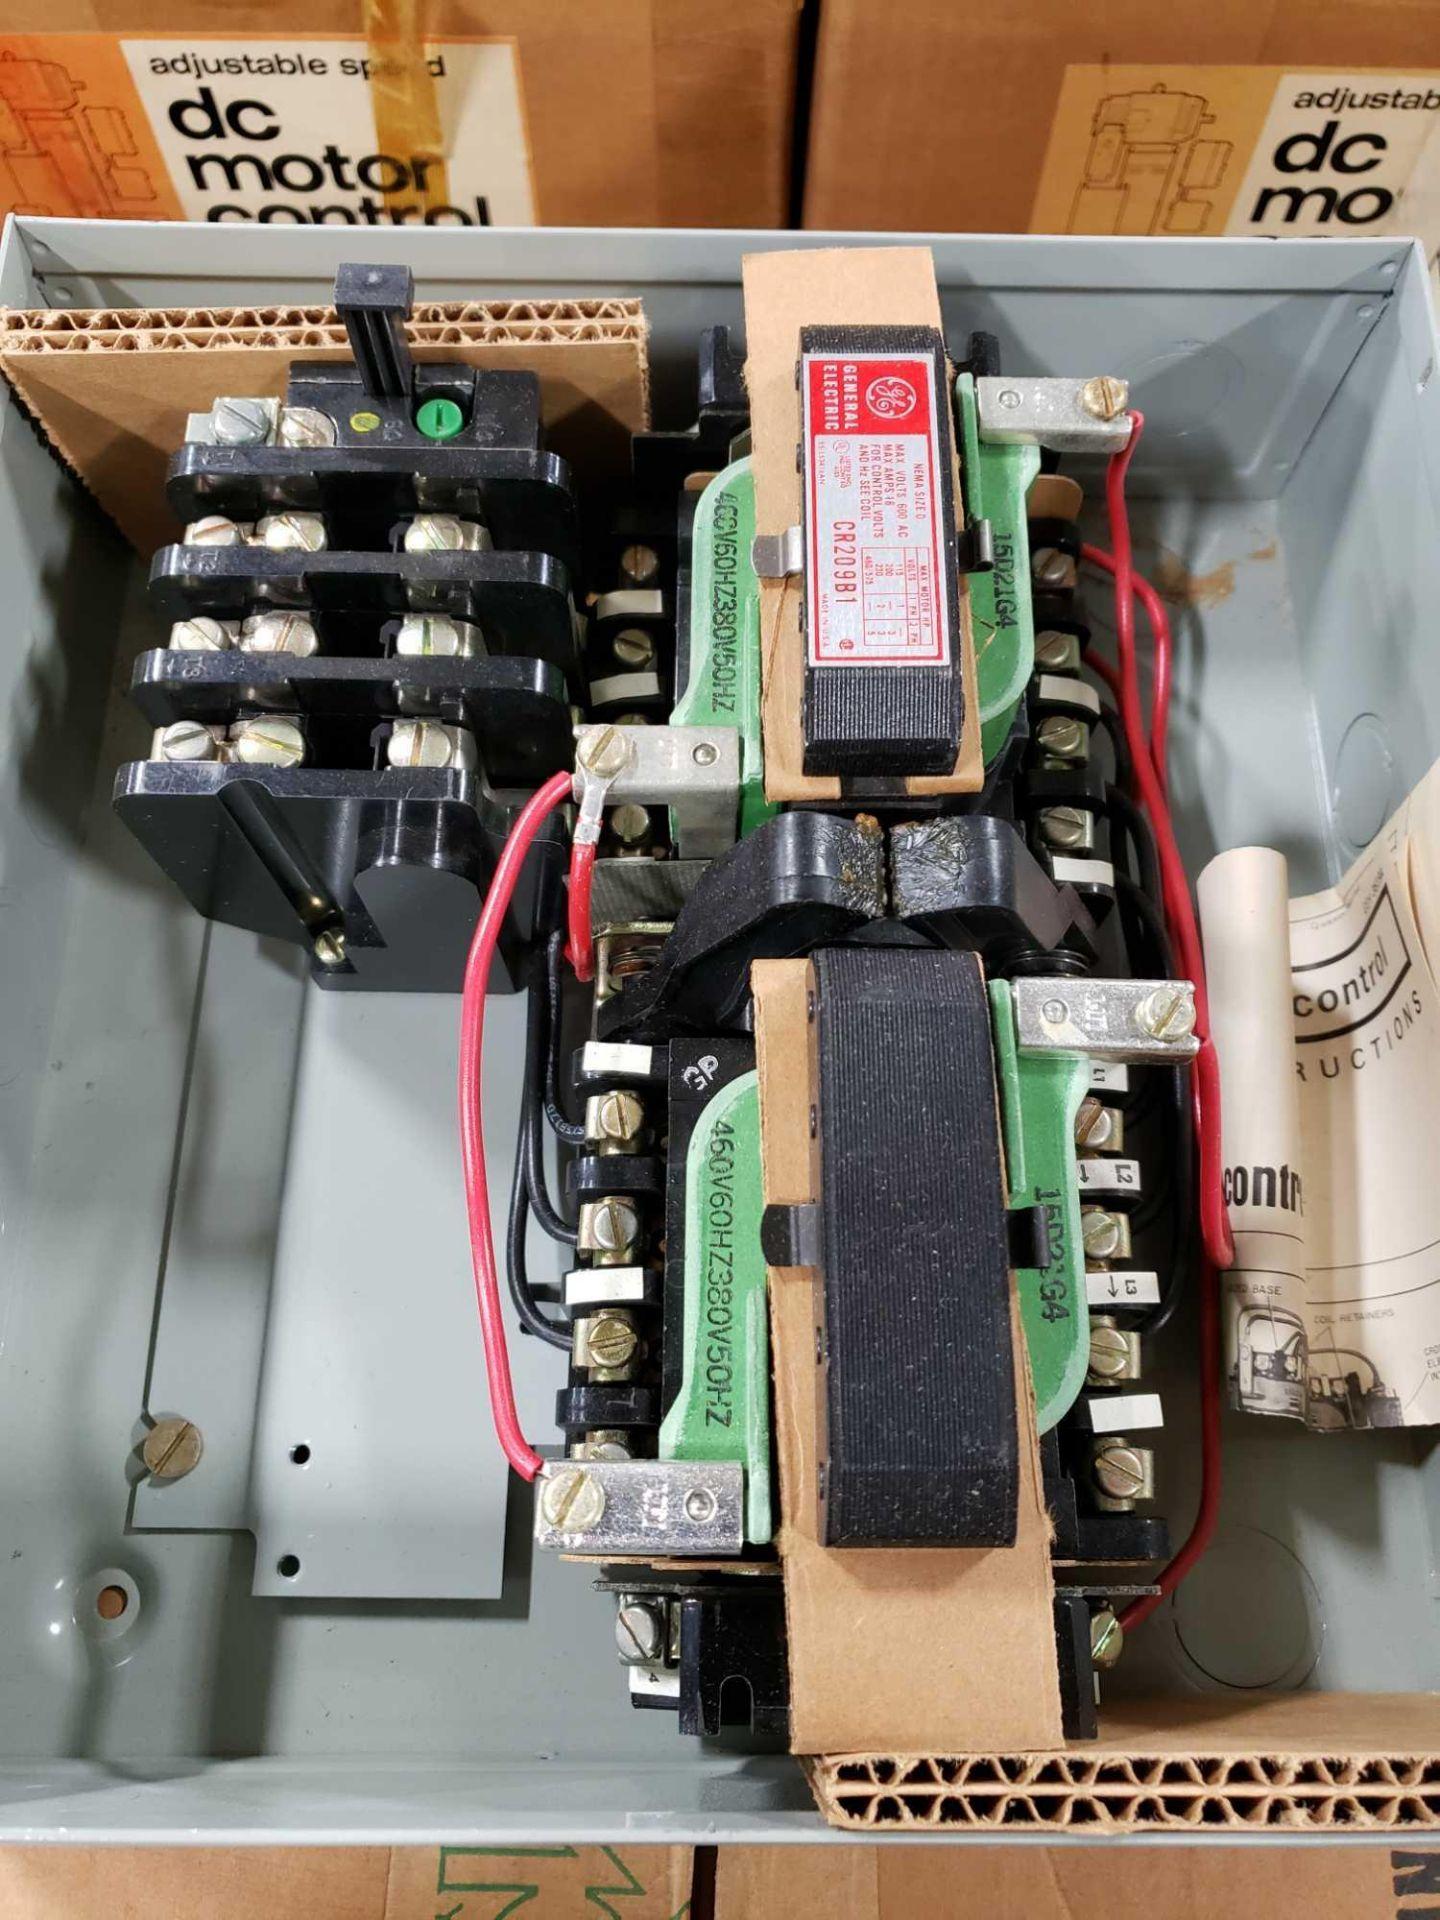 Lot 5 - GE magnetic controller reversing contractor CR209B104 Nema size O, nema 1 enclosure. New in box.